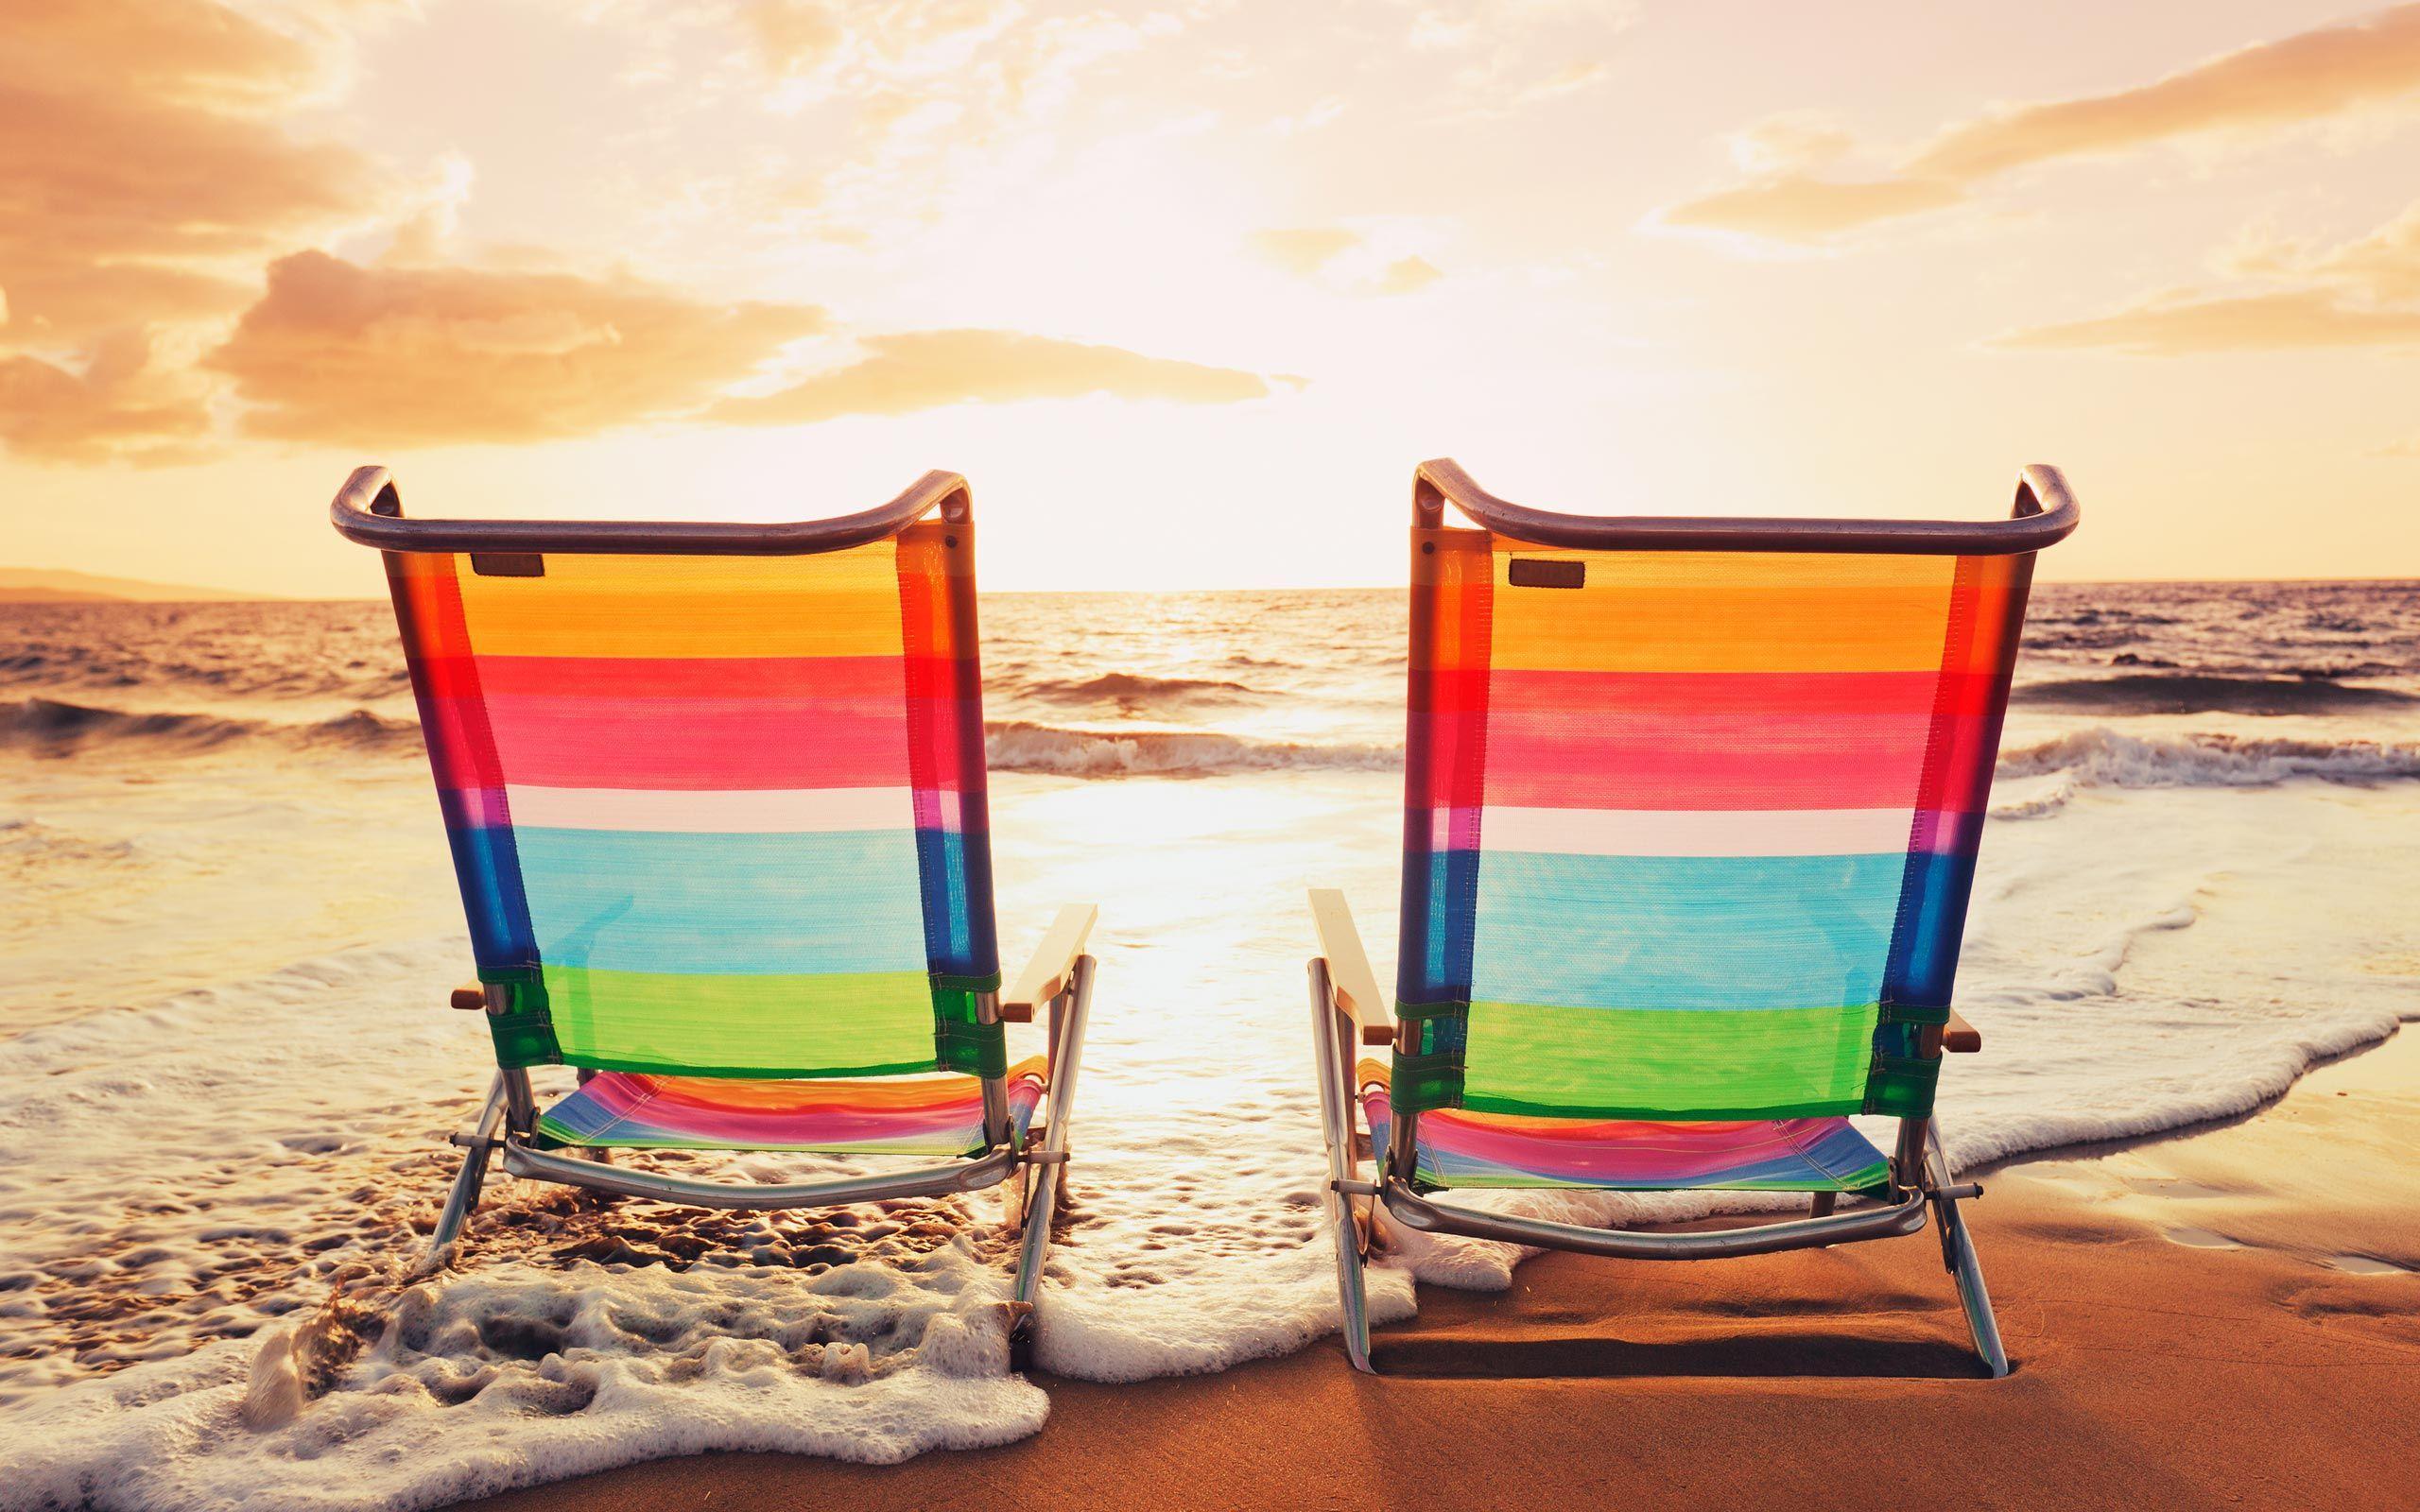 Beach Chair Wallpapers Top Free Beach Chair Backgrounds Wallpaperaccess